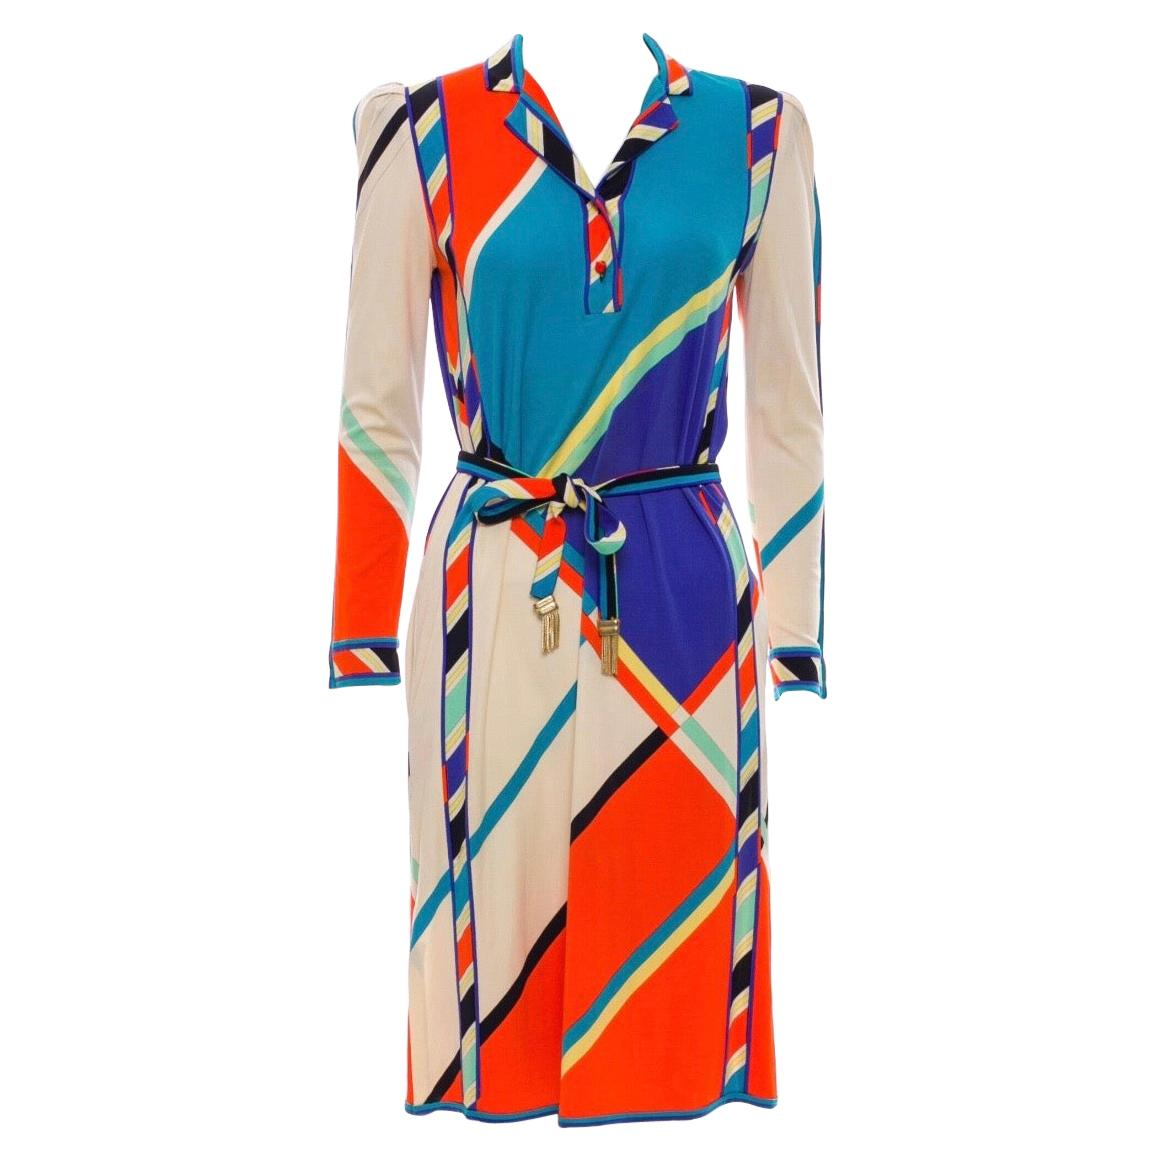 Leonard Paris 1970s Printed Silk Jersey Dress